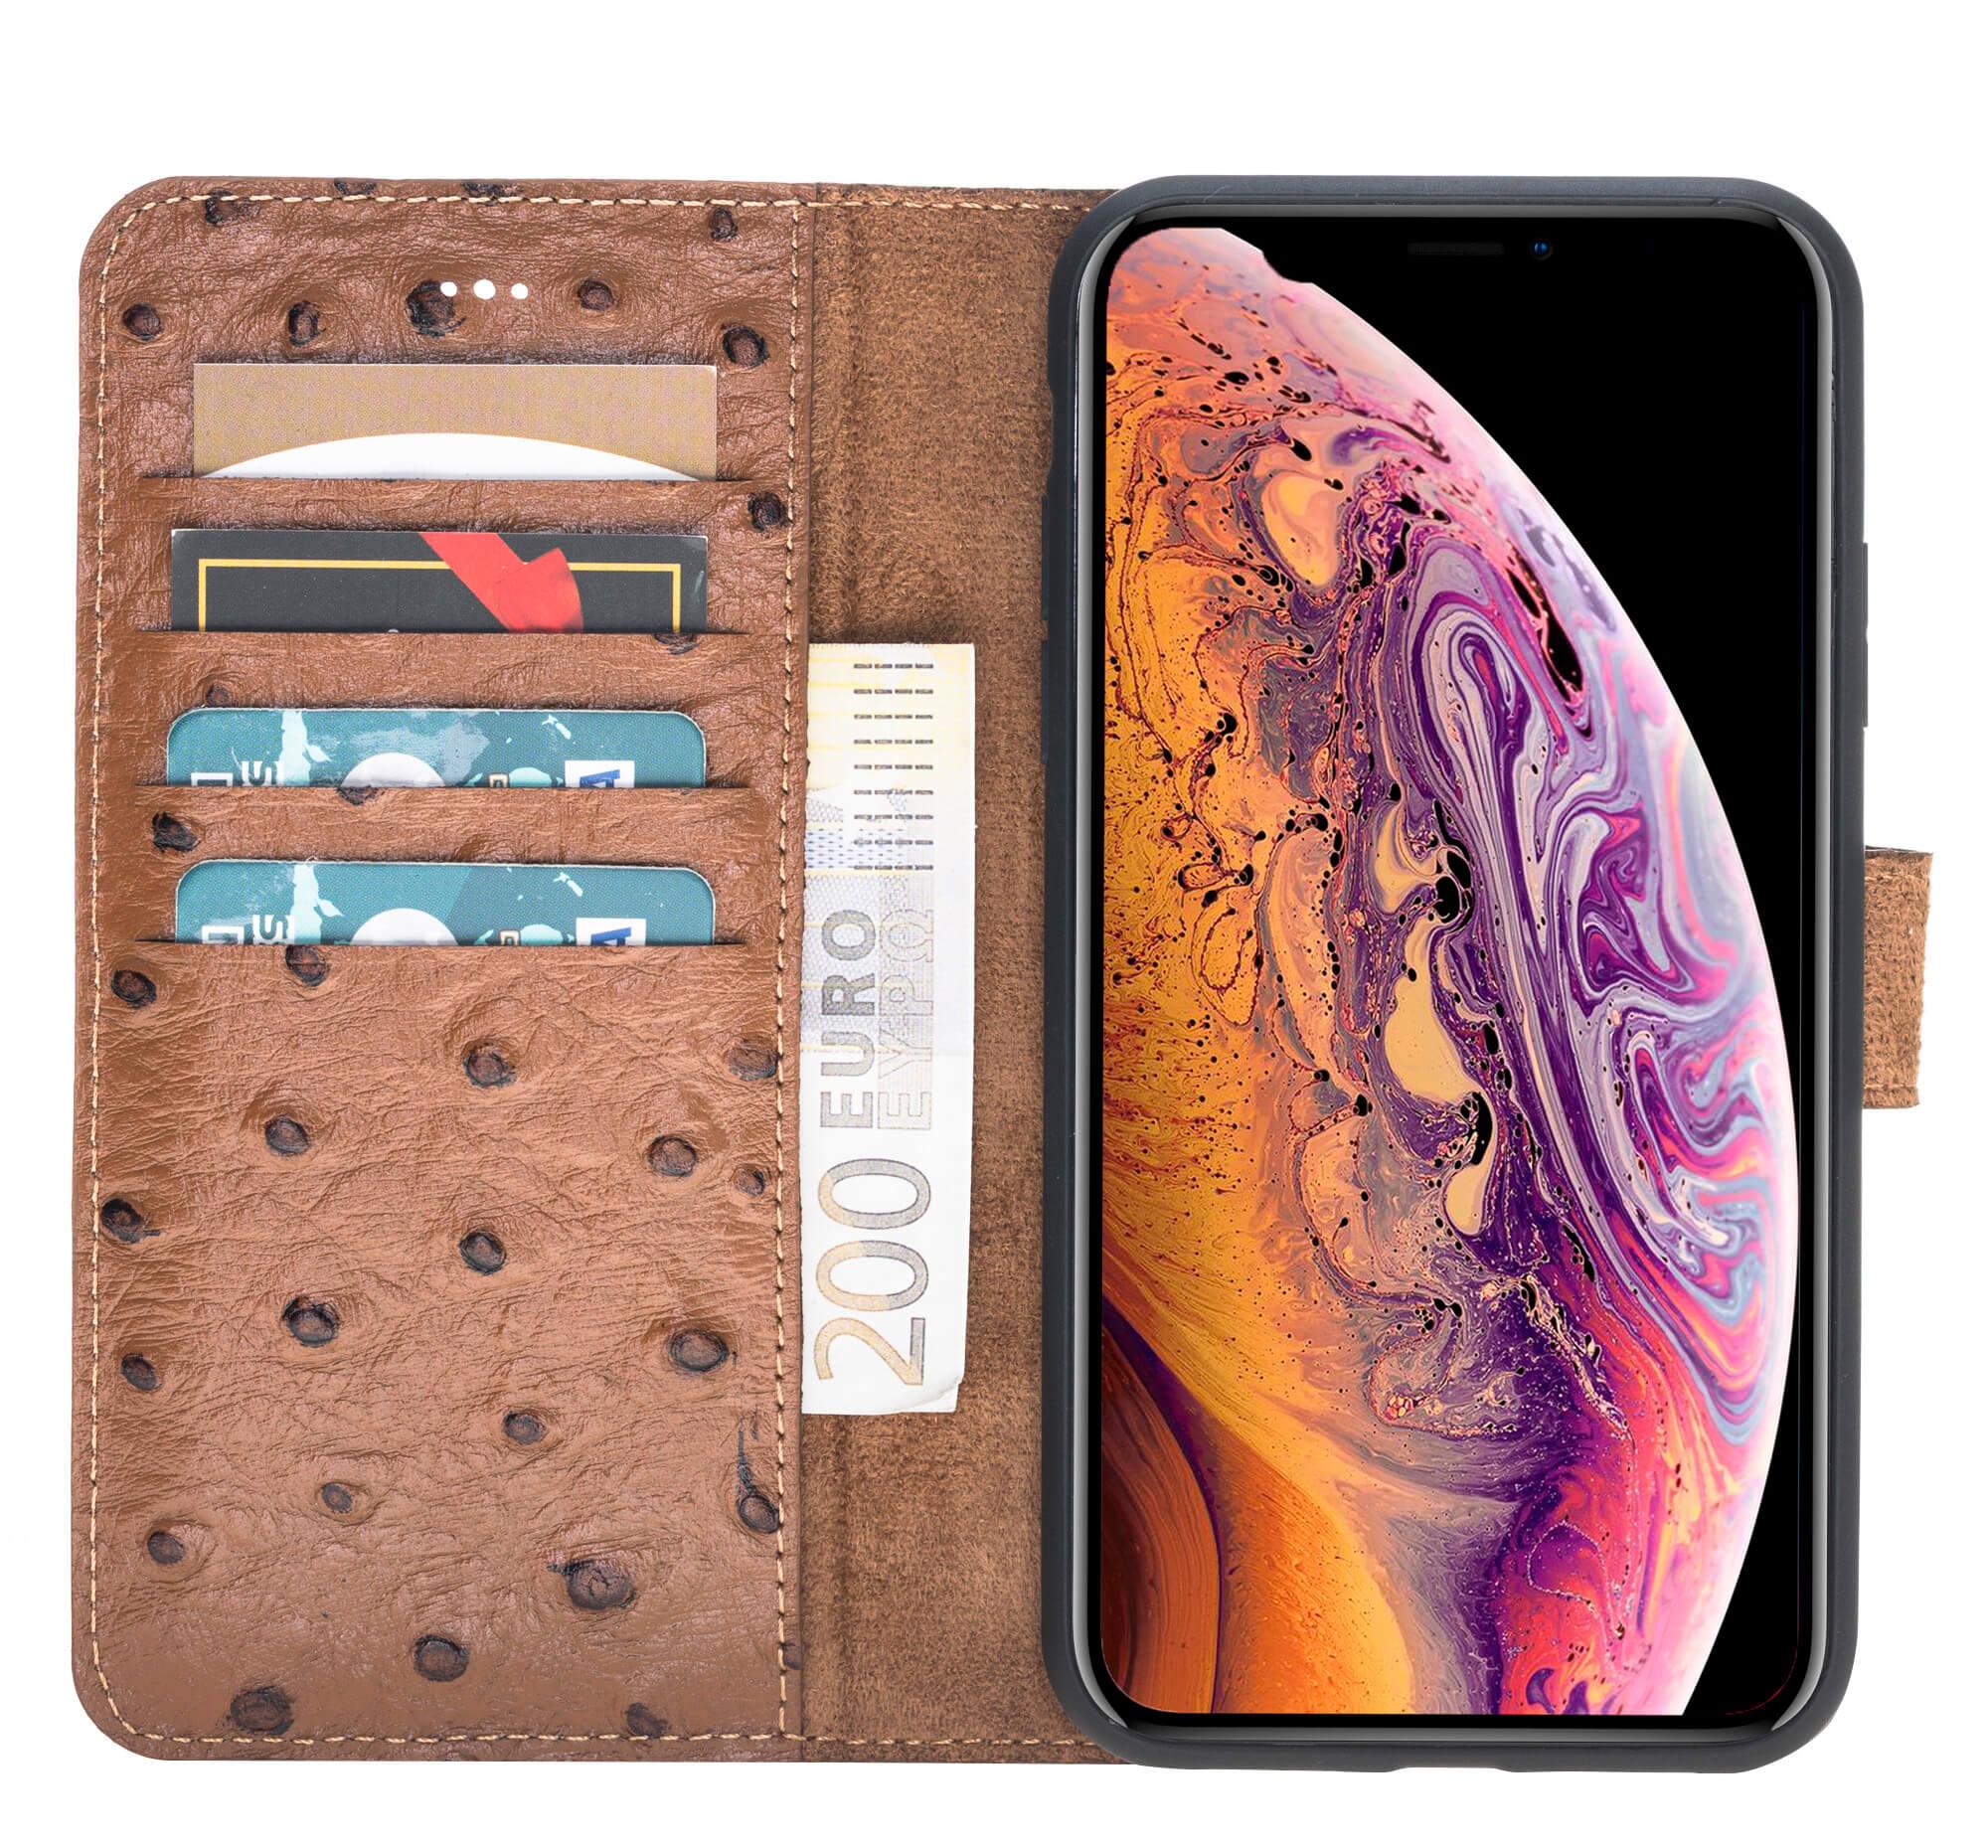 iPhone Xr Abnehmbare Lederhülle (2in1) in Straussprägung Braun